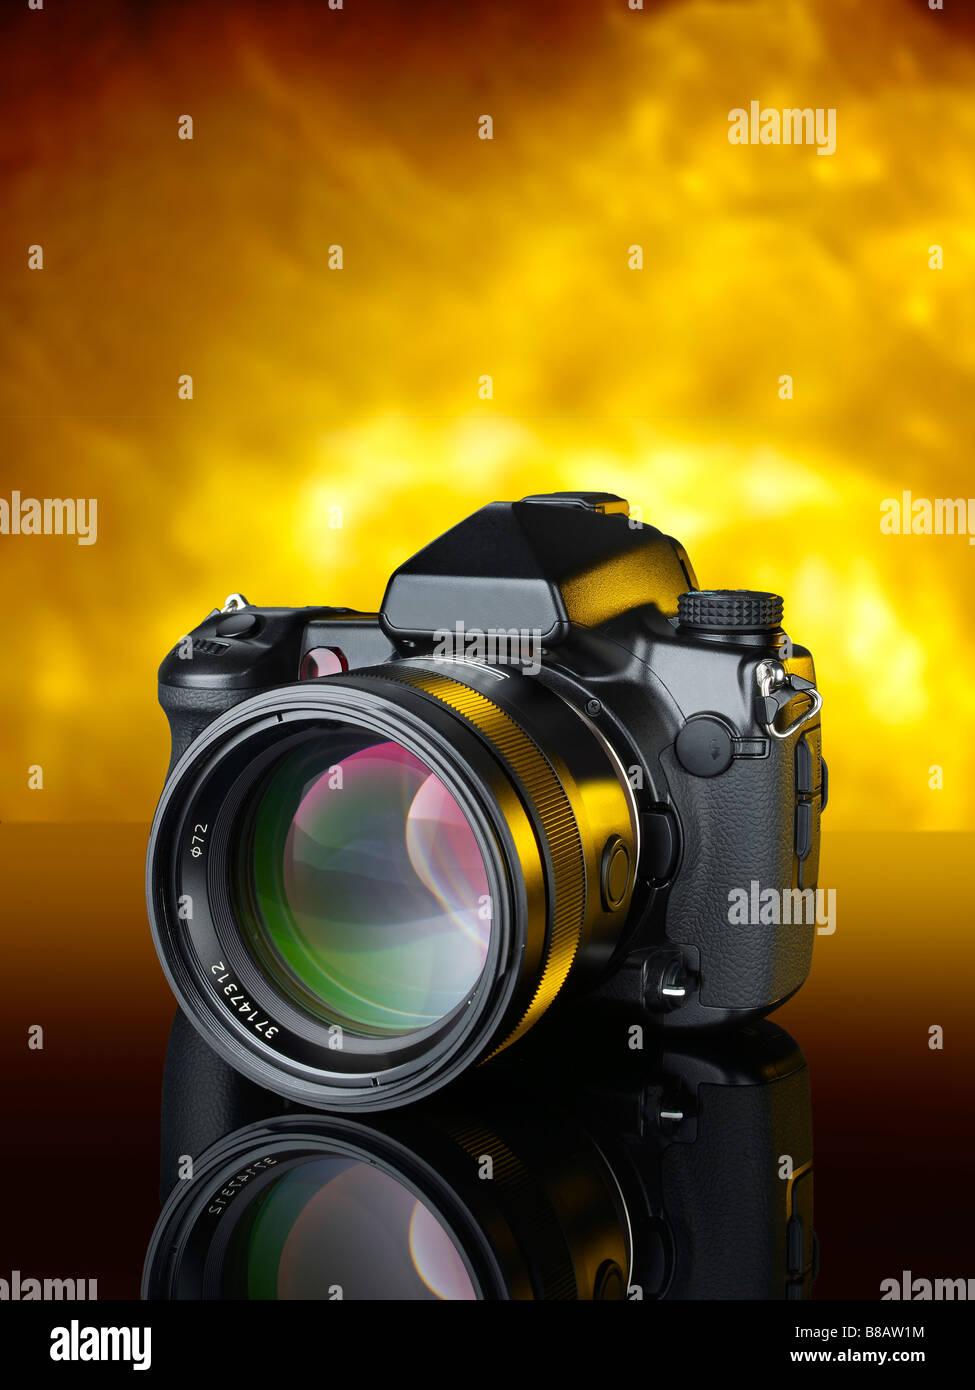 DSLR 35mm Digital Camera vertical - Stock Image